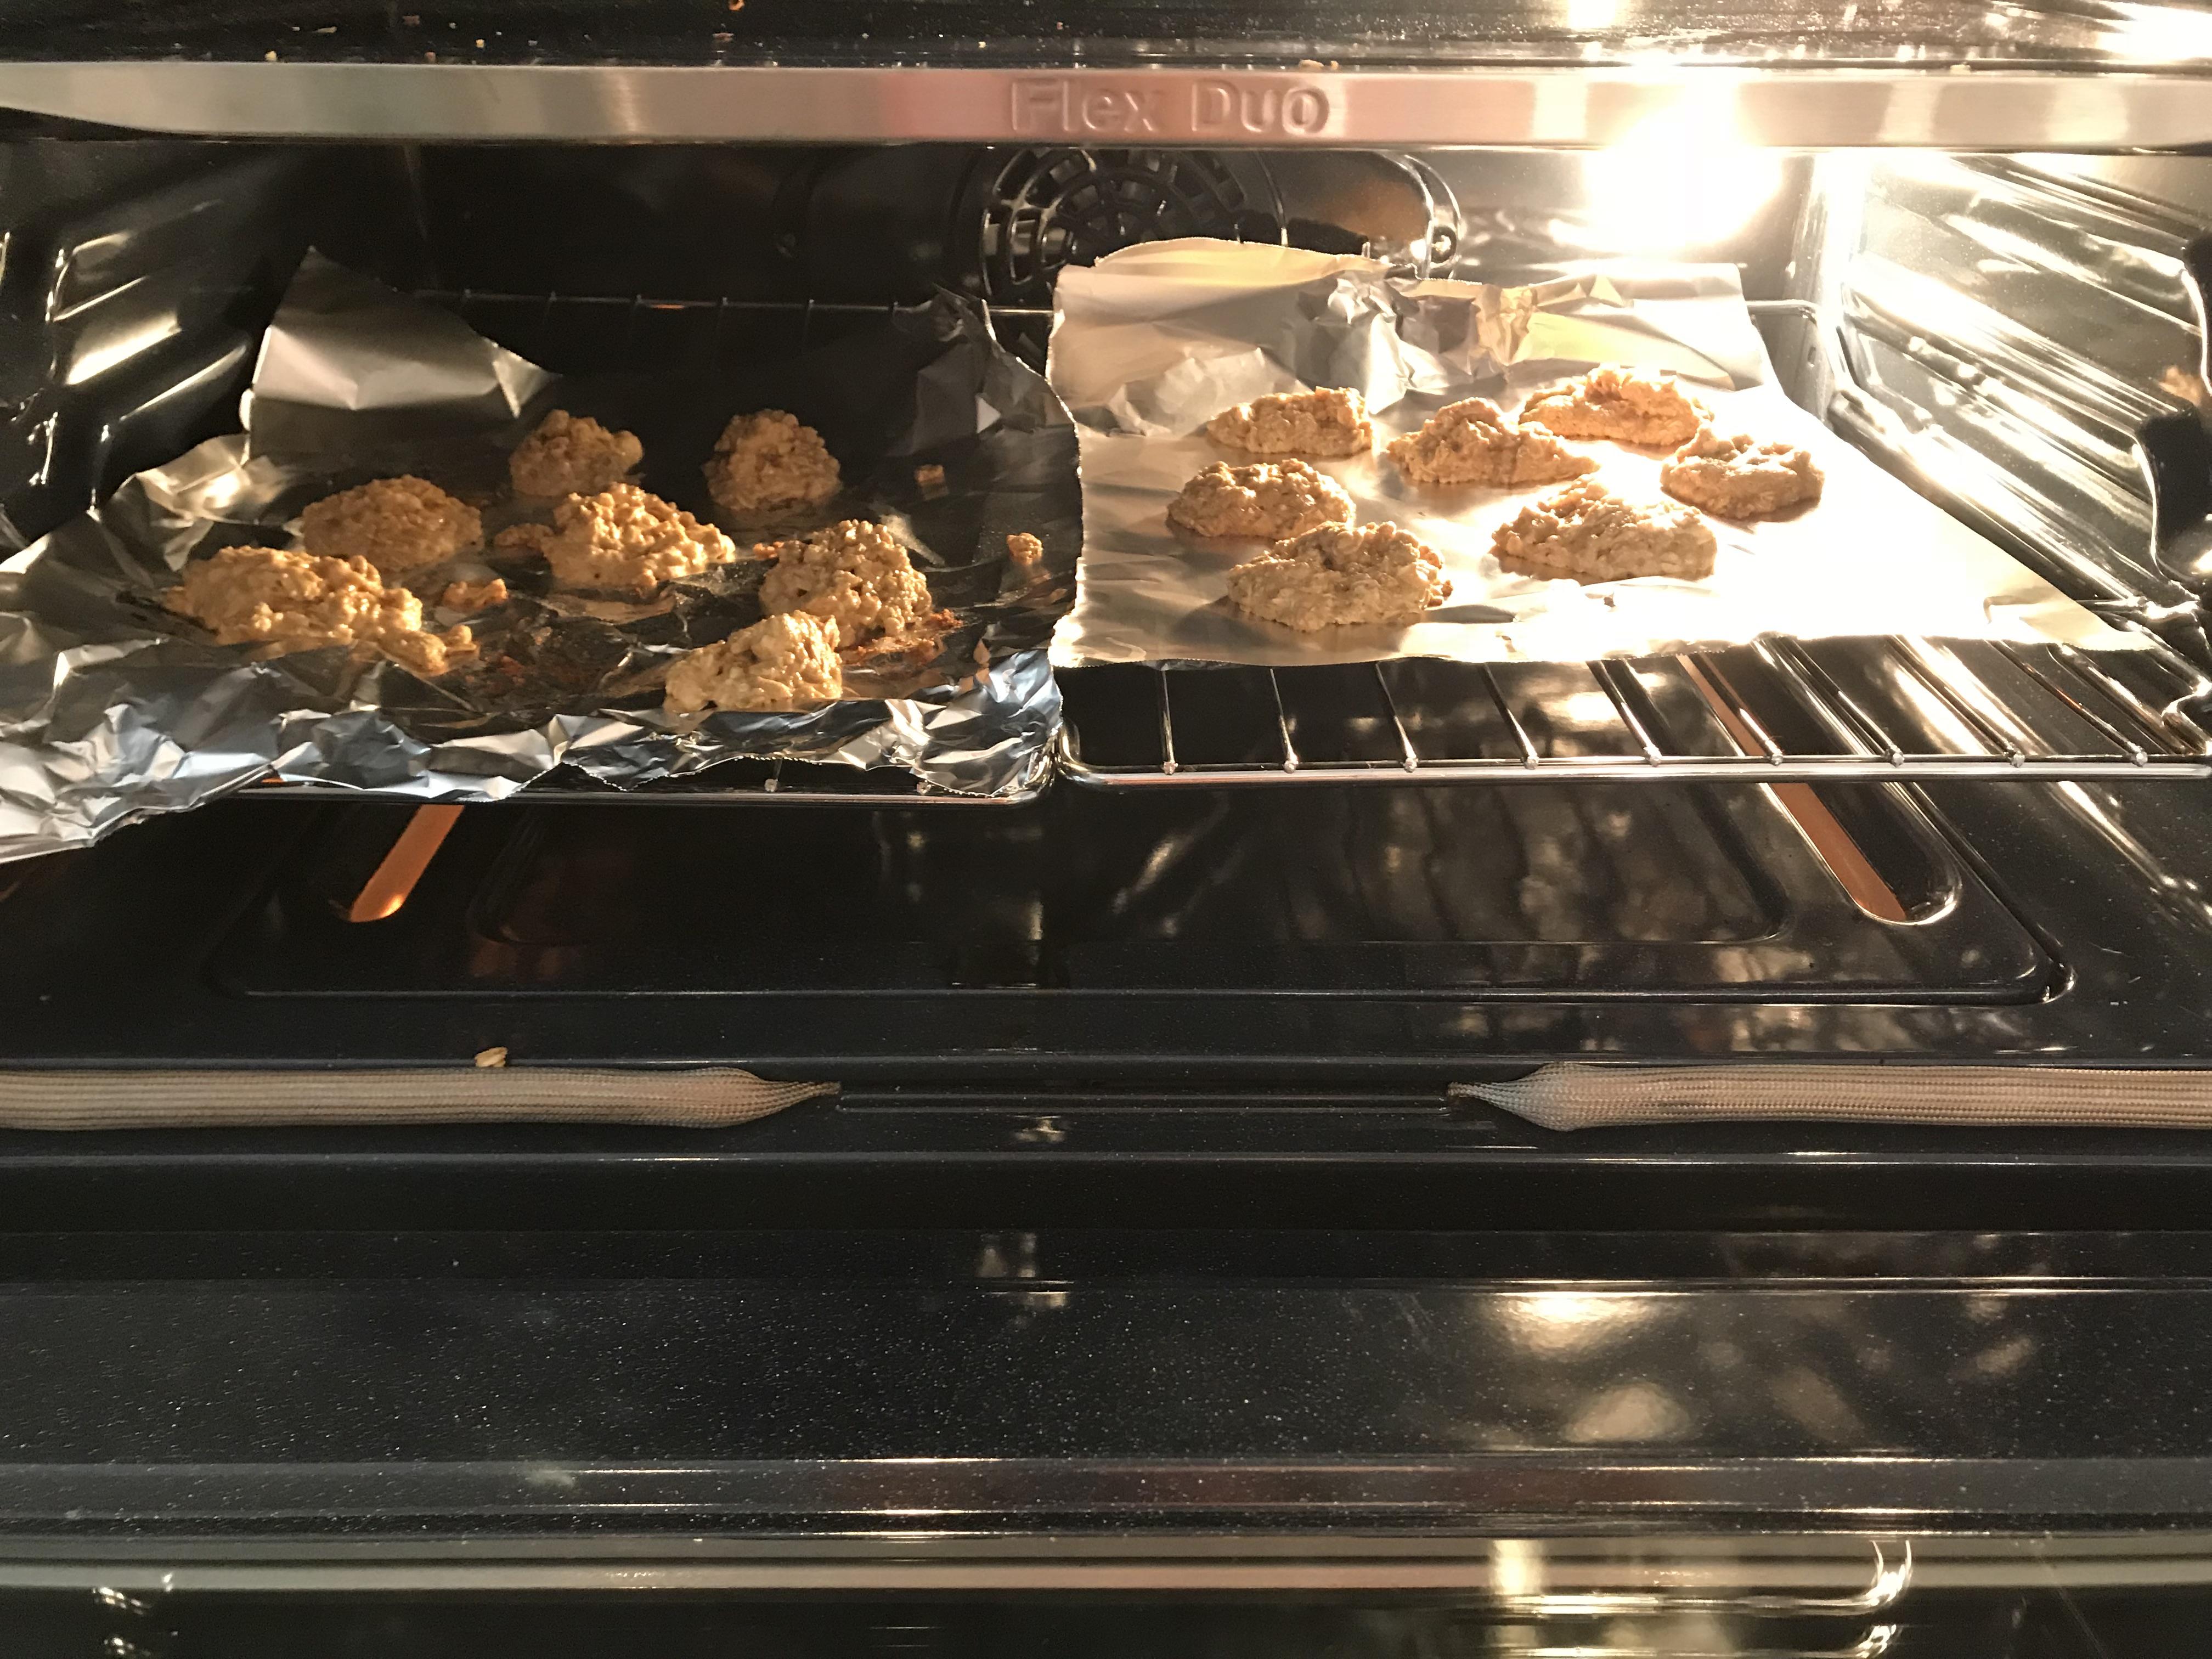 Weight Watchers Oatmeal treats Recipe (Just three points per treat recipe makes 40 treats)